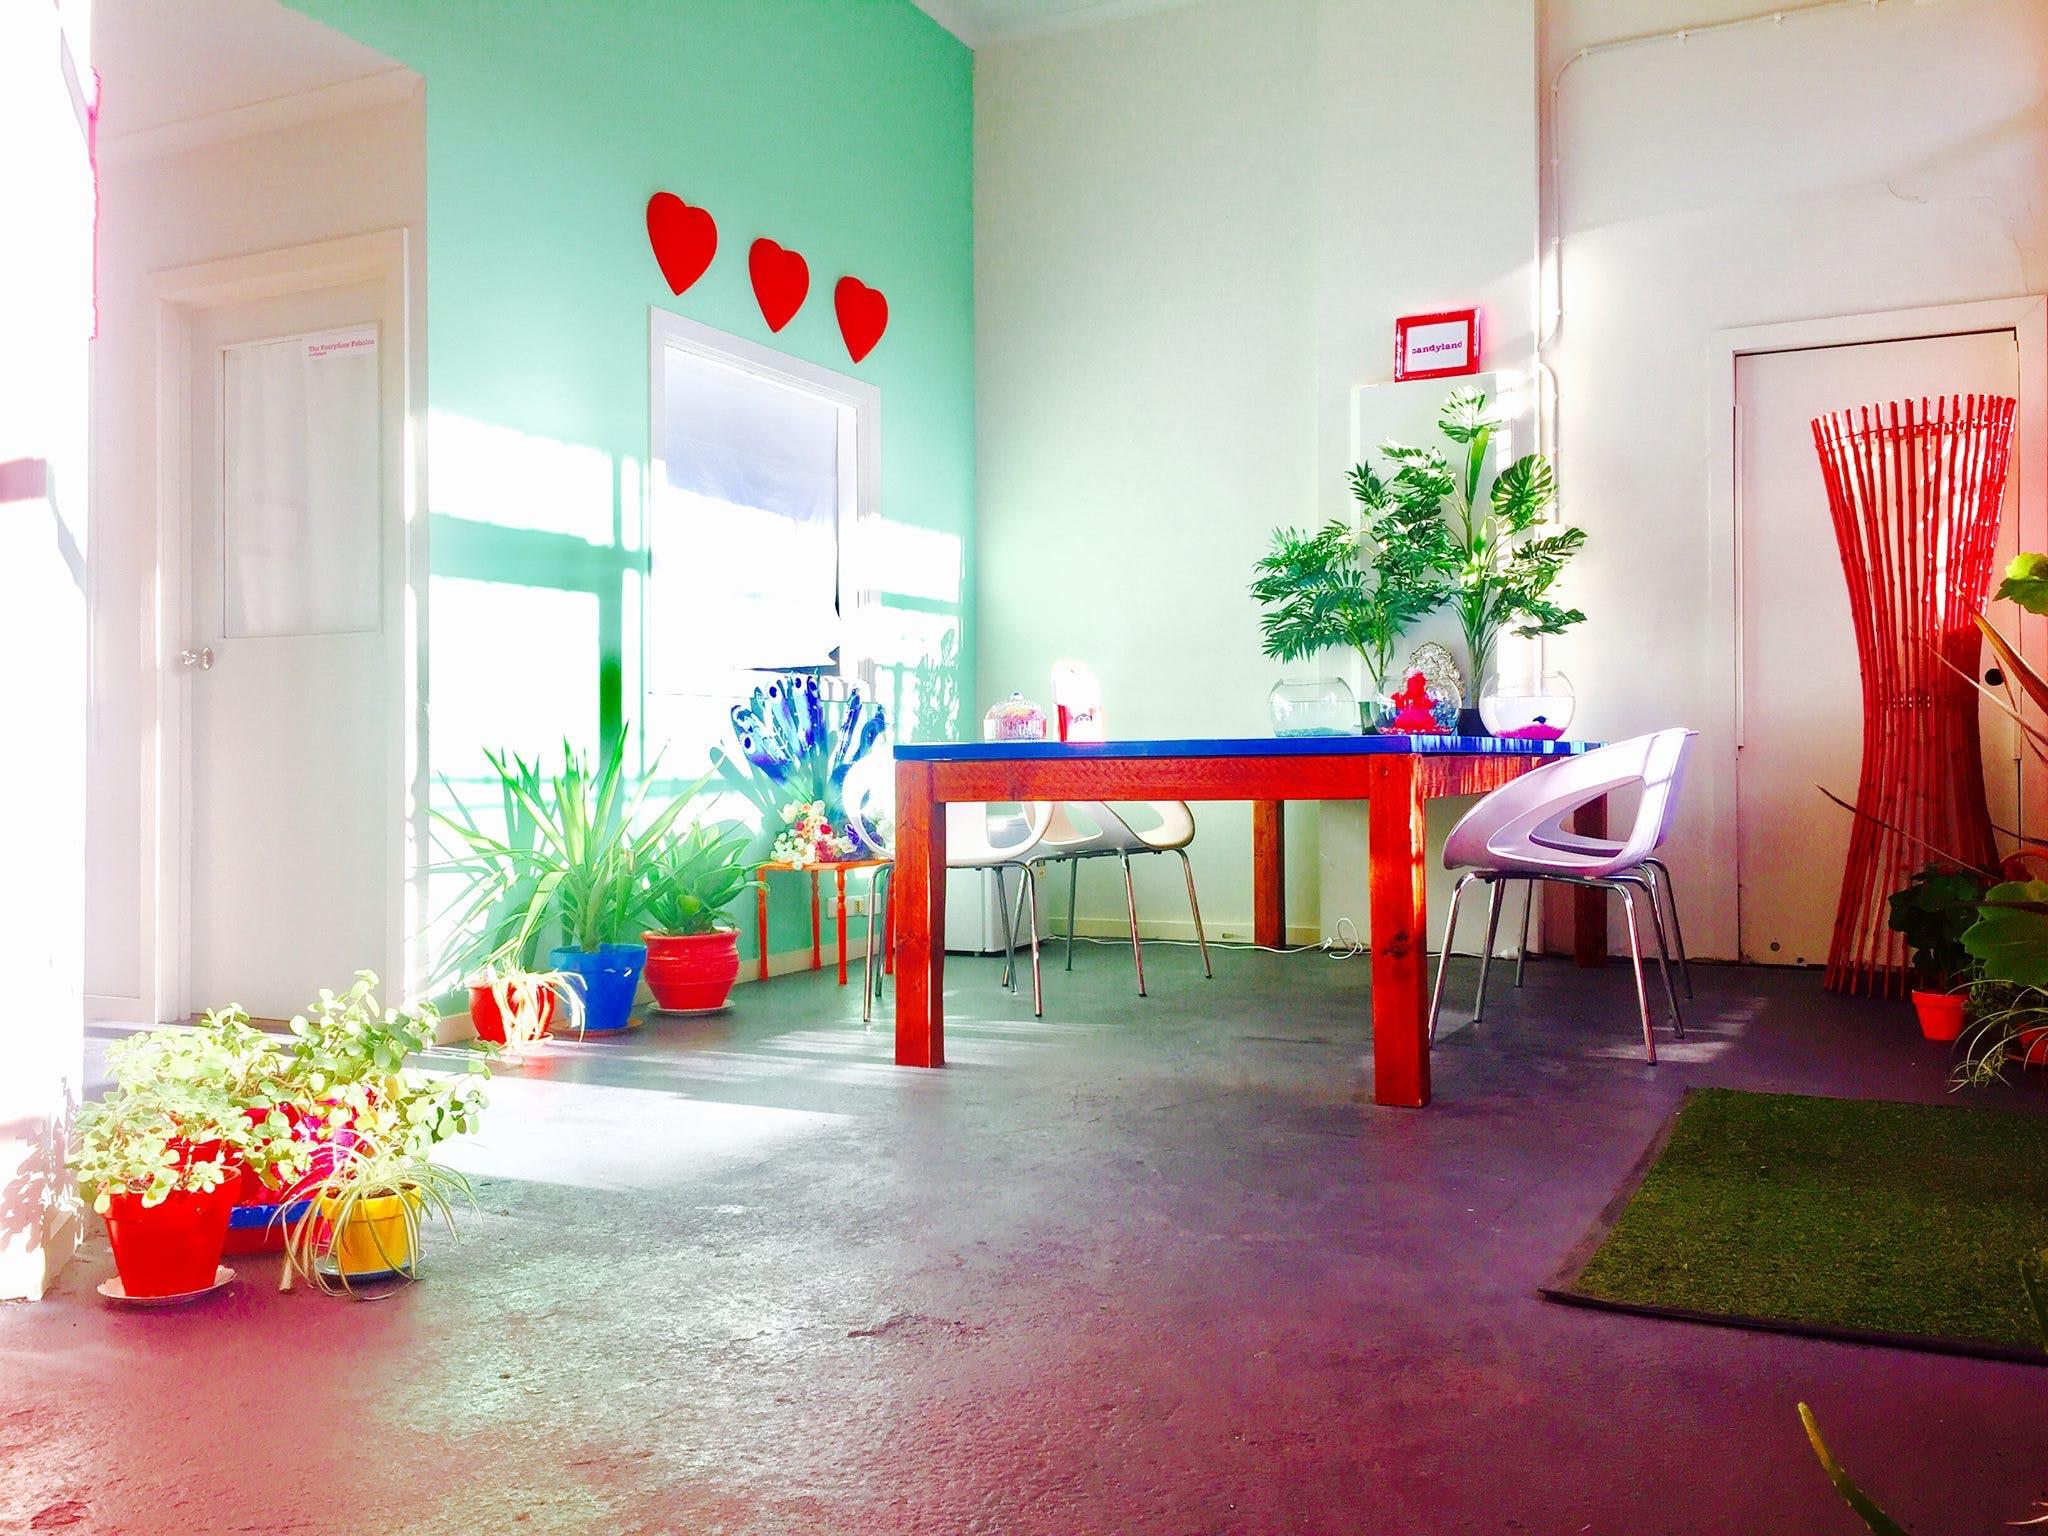 Sherbert Showroom, multi-use area at Candyland, image 1